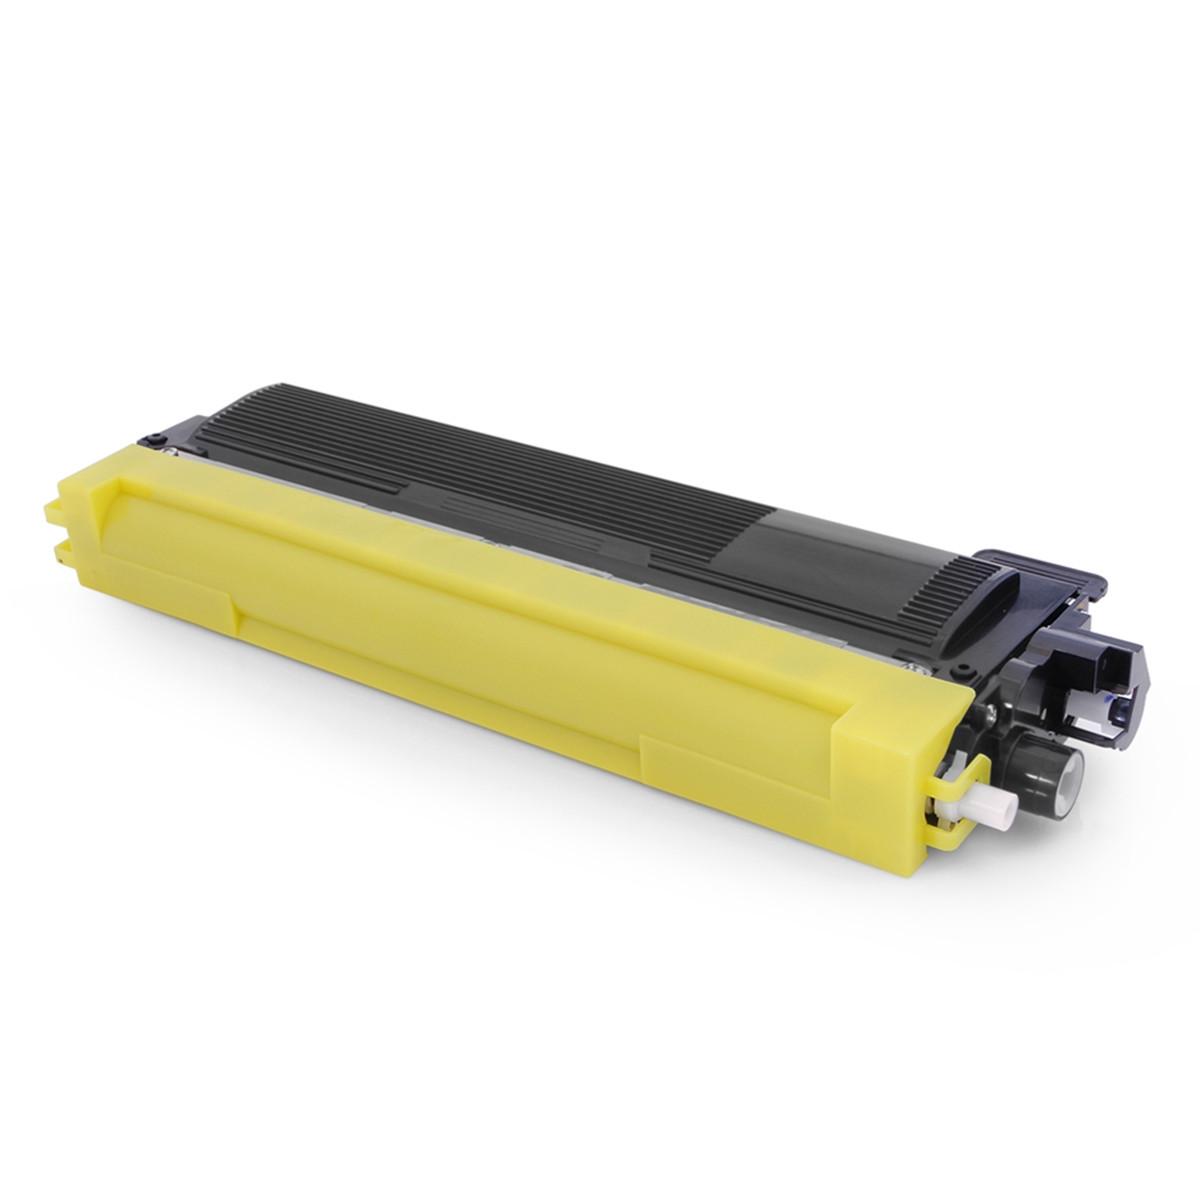 Toner Compatível com Brother TN230M TN230 Magenta | HL3040CN MFC9010CN MFC9320CW | Chinamate 1.4k